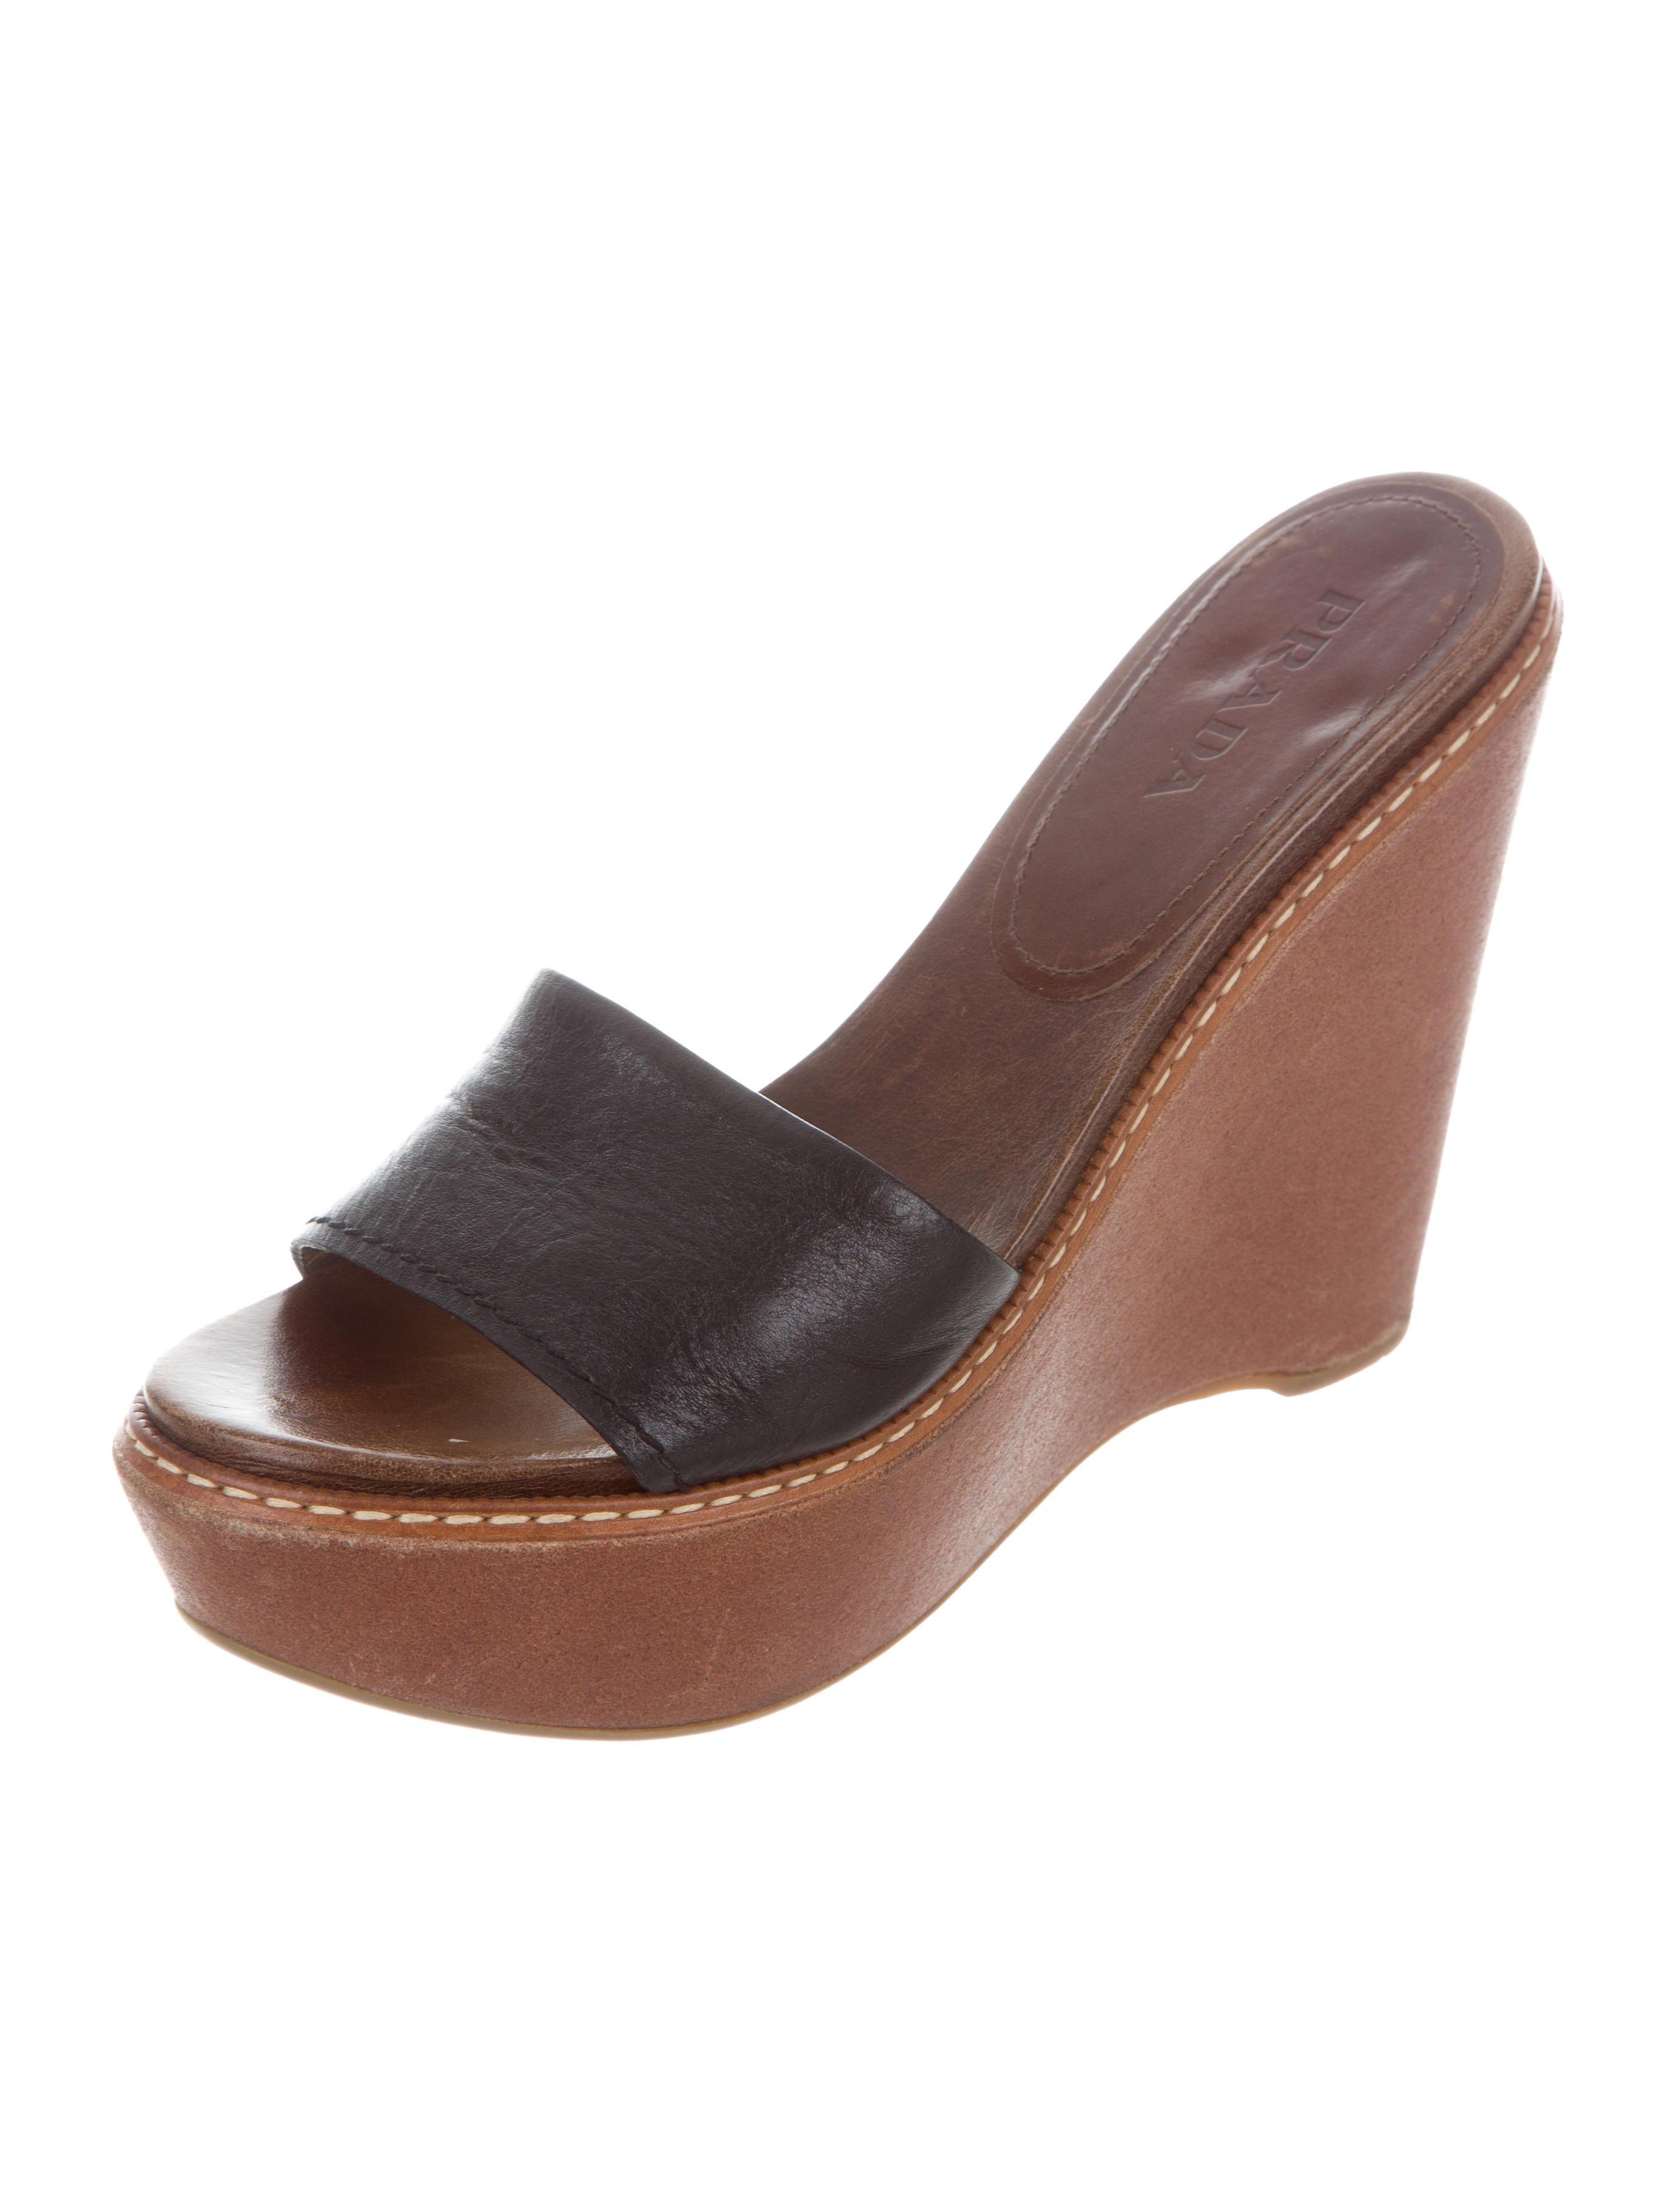 prada platform slide wedges shoes pra162868 the realreal